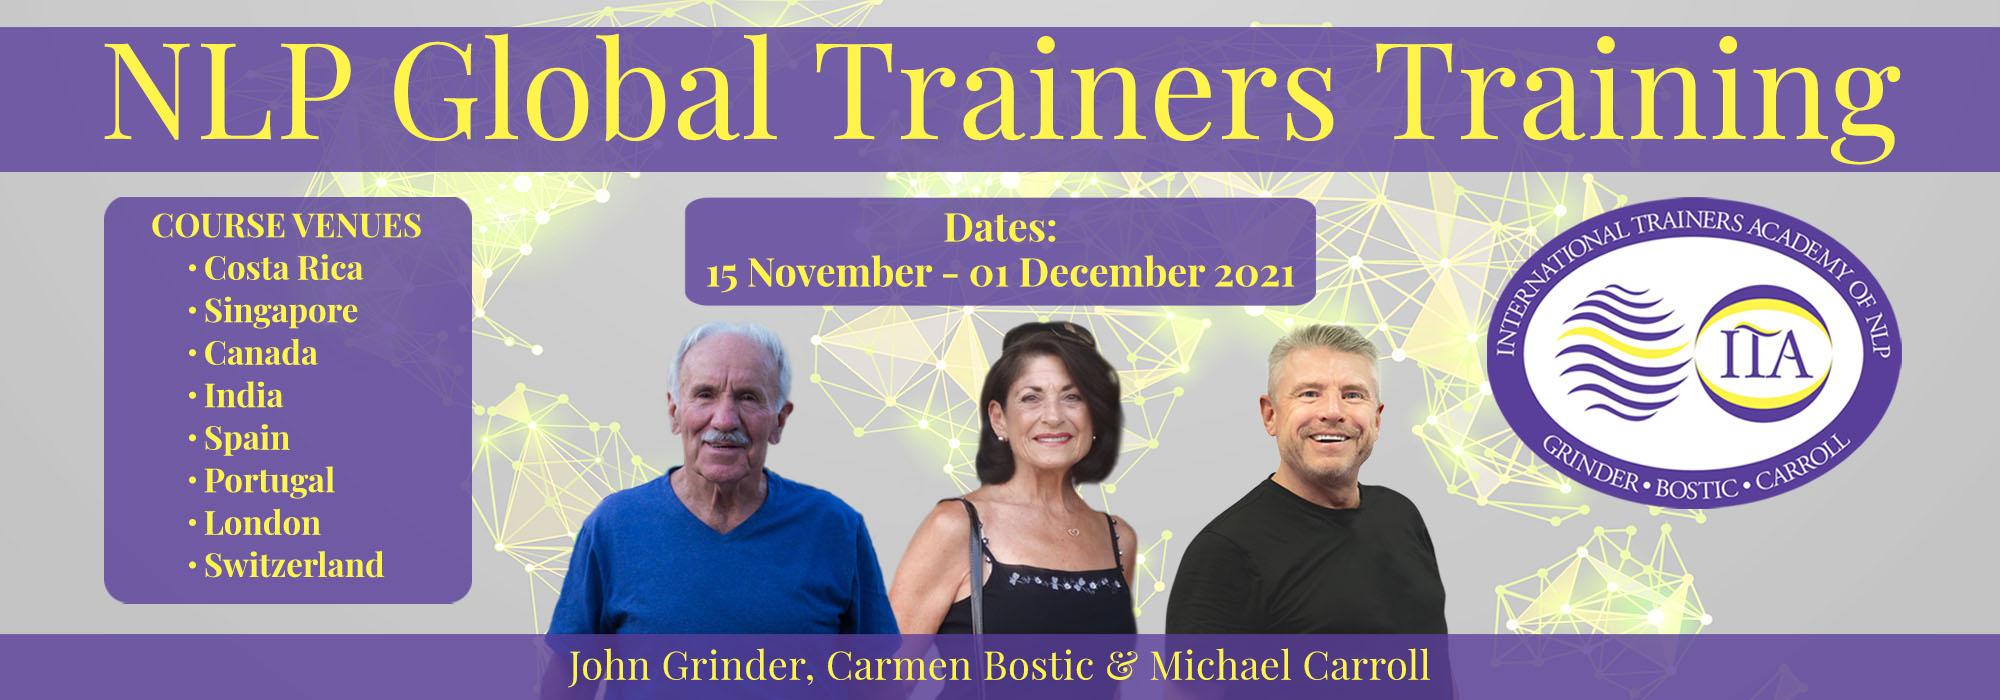 NLP Global Trainers Training